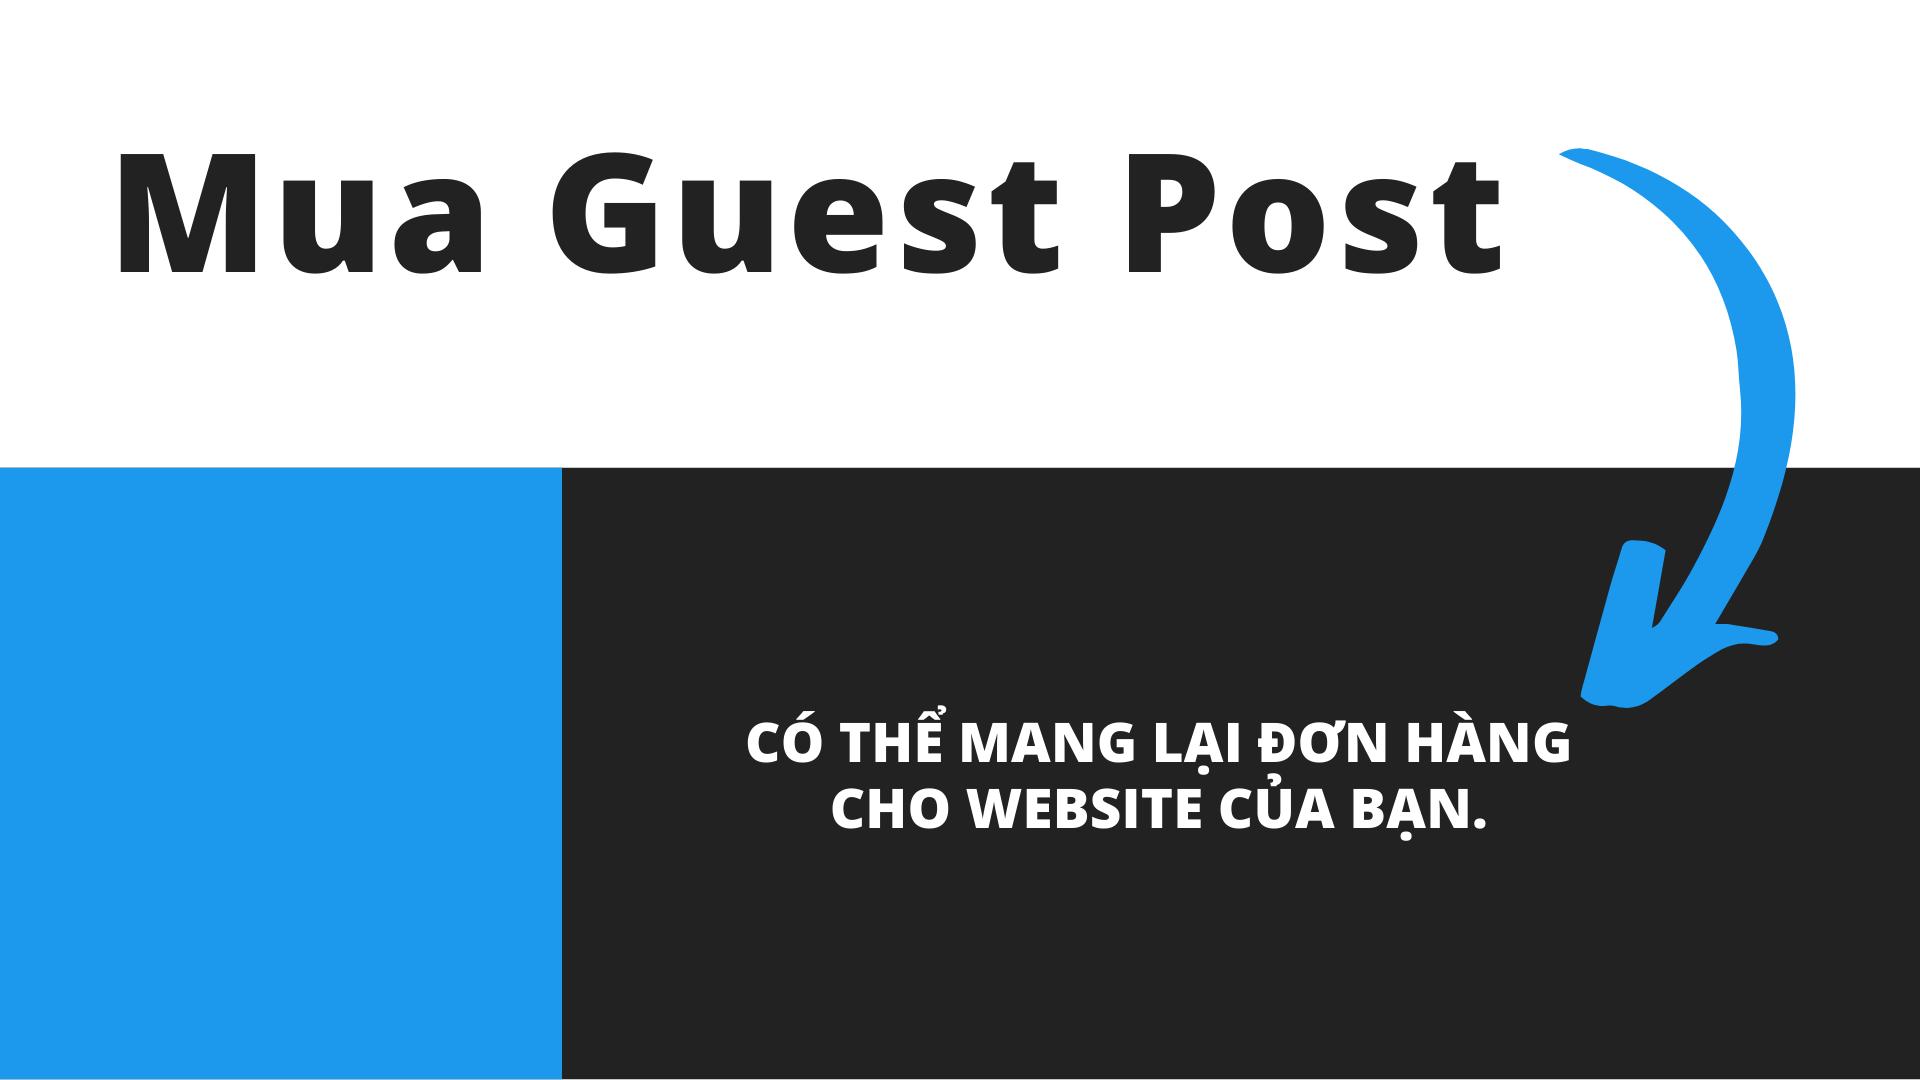 Mua Guest Post